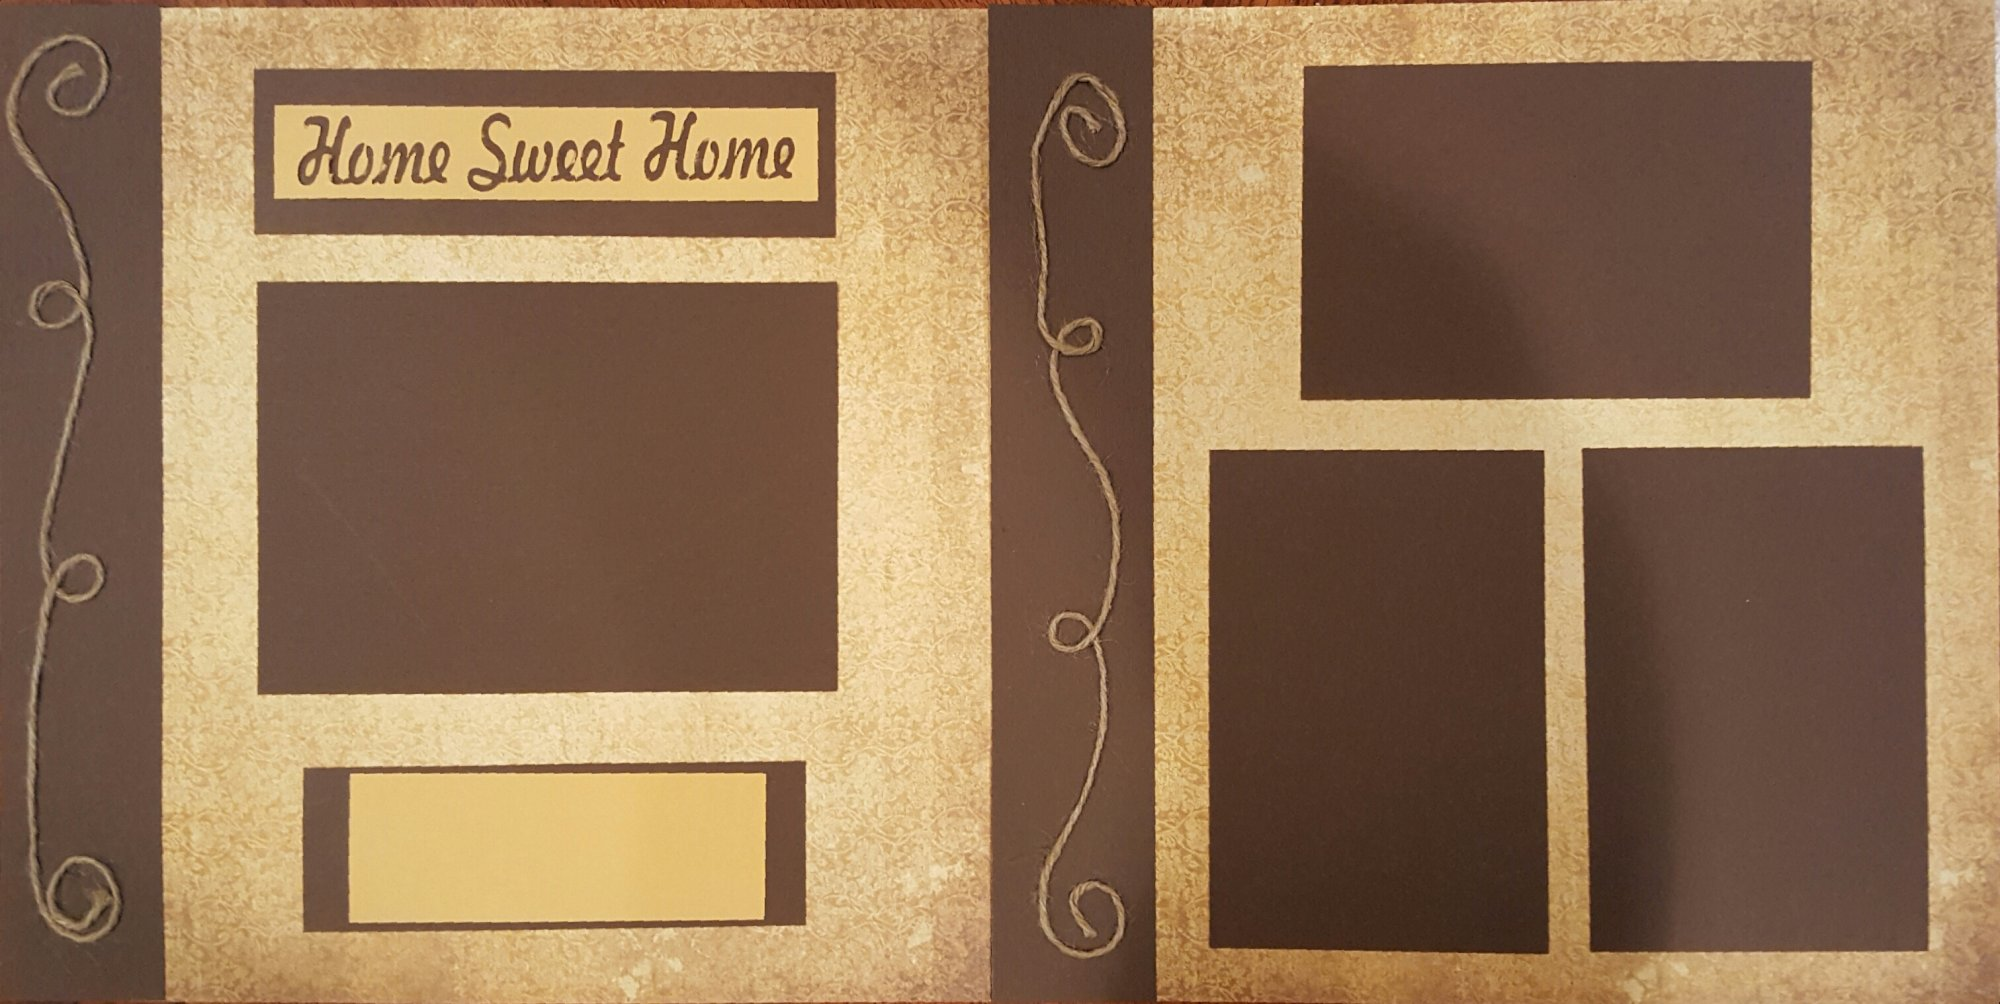 Home Sweet Home (Sample)